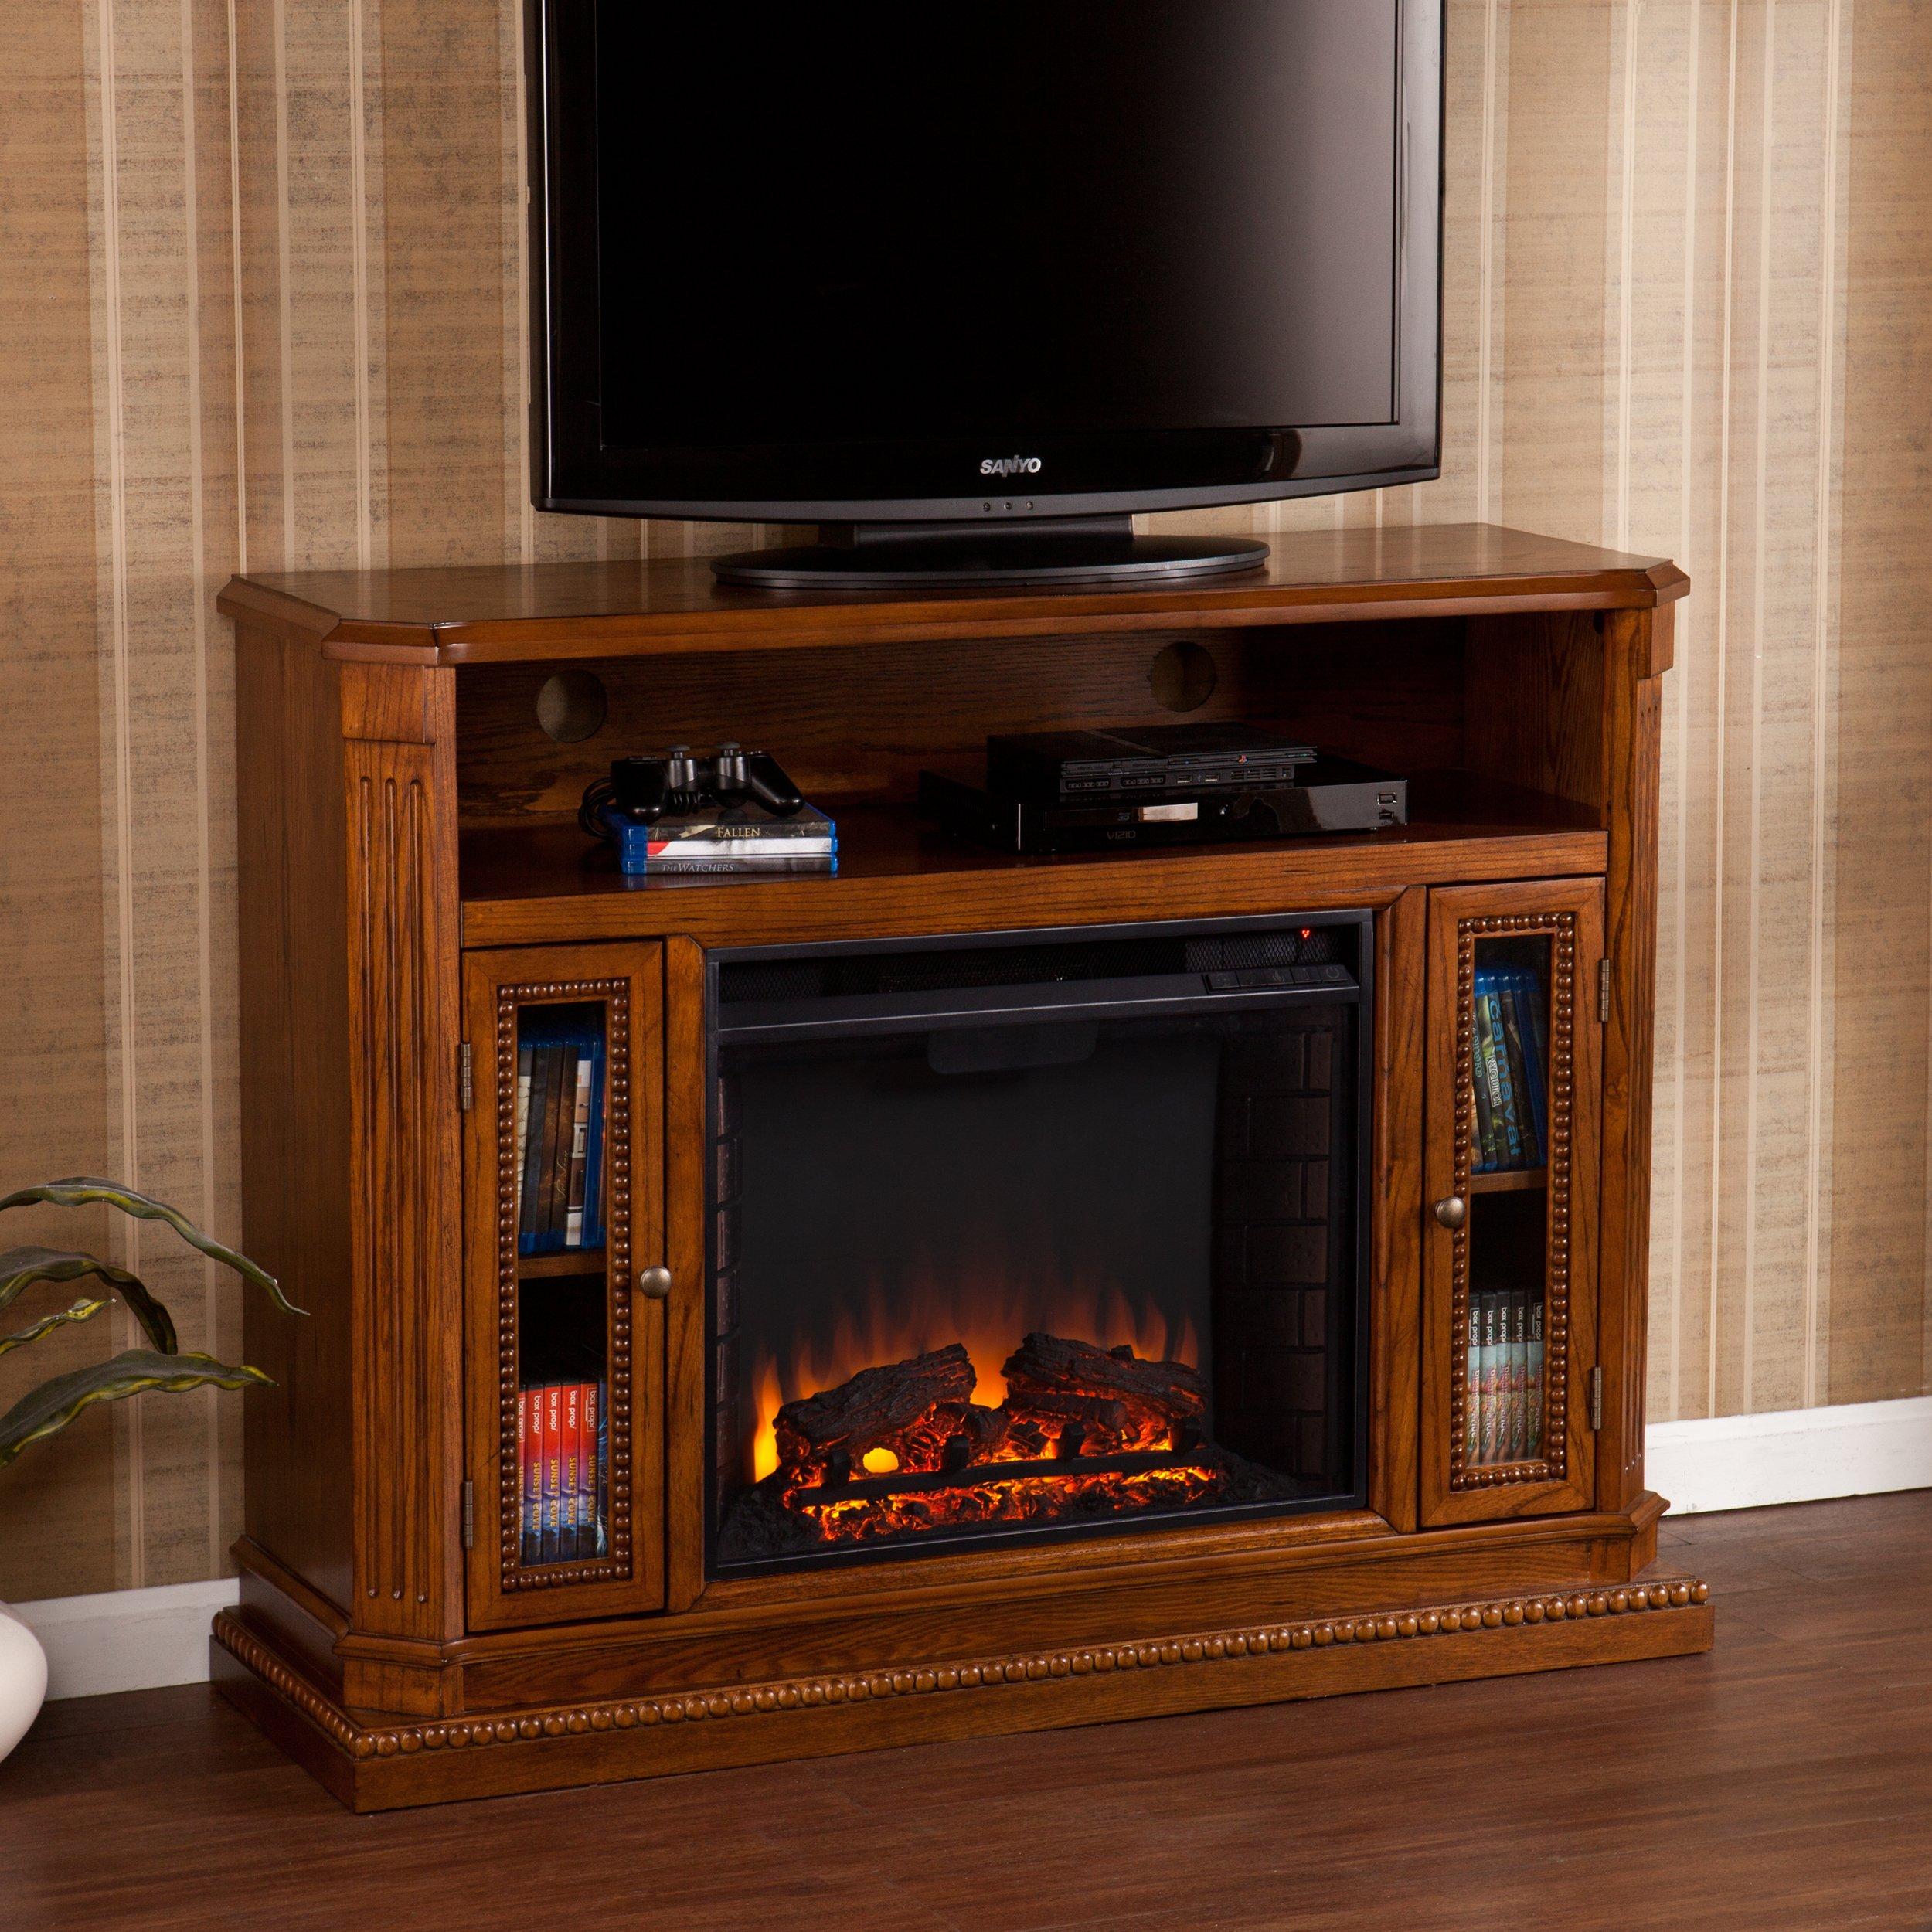 Southern Enterprises Atkinson Media Fireplace 47'' Wide, Rich Brown Oak Finish